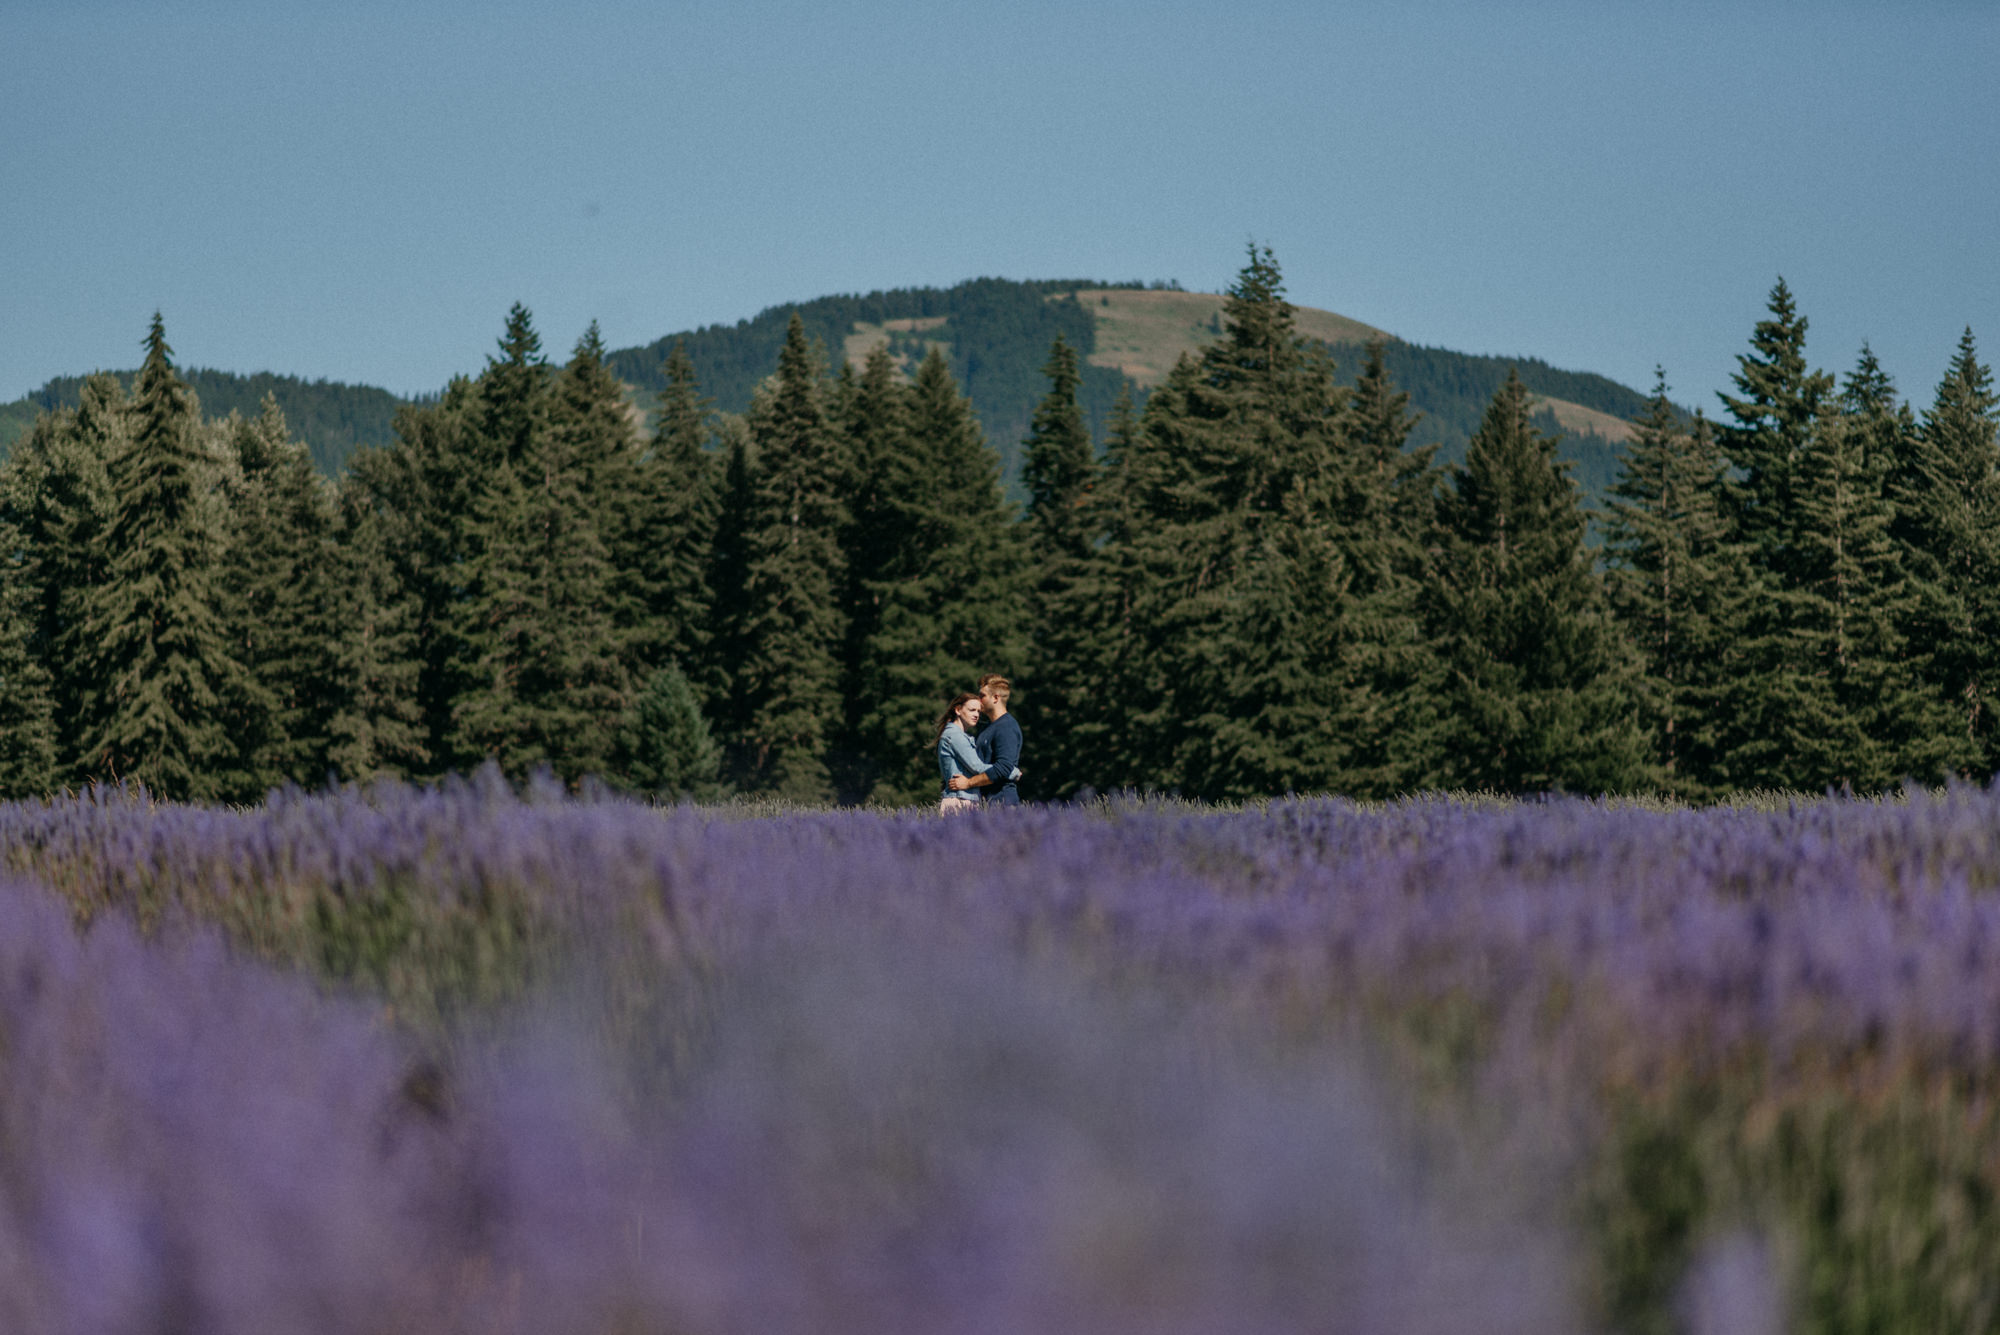 20-Mt-hood-lavender-farms-engagment-couple-summer-7542.jpg